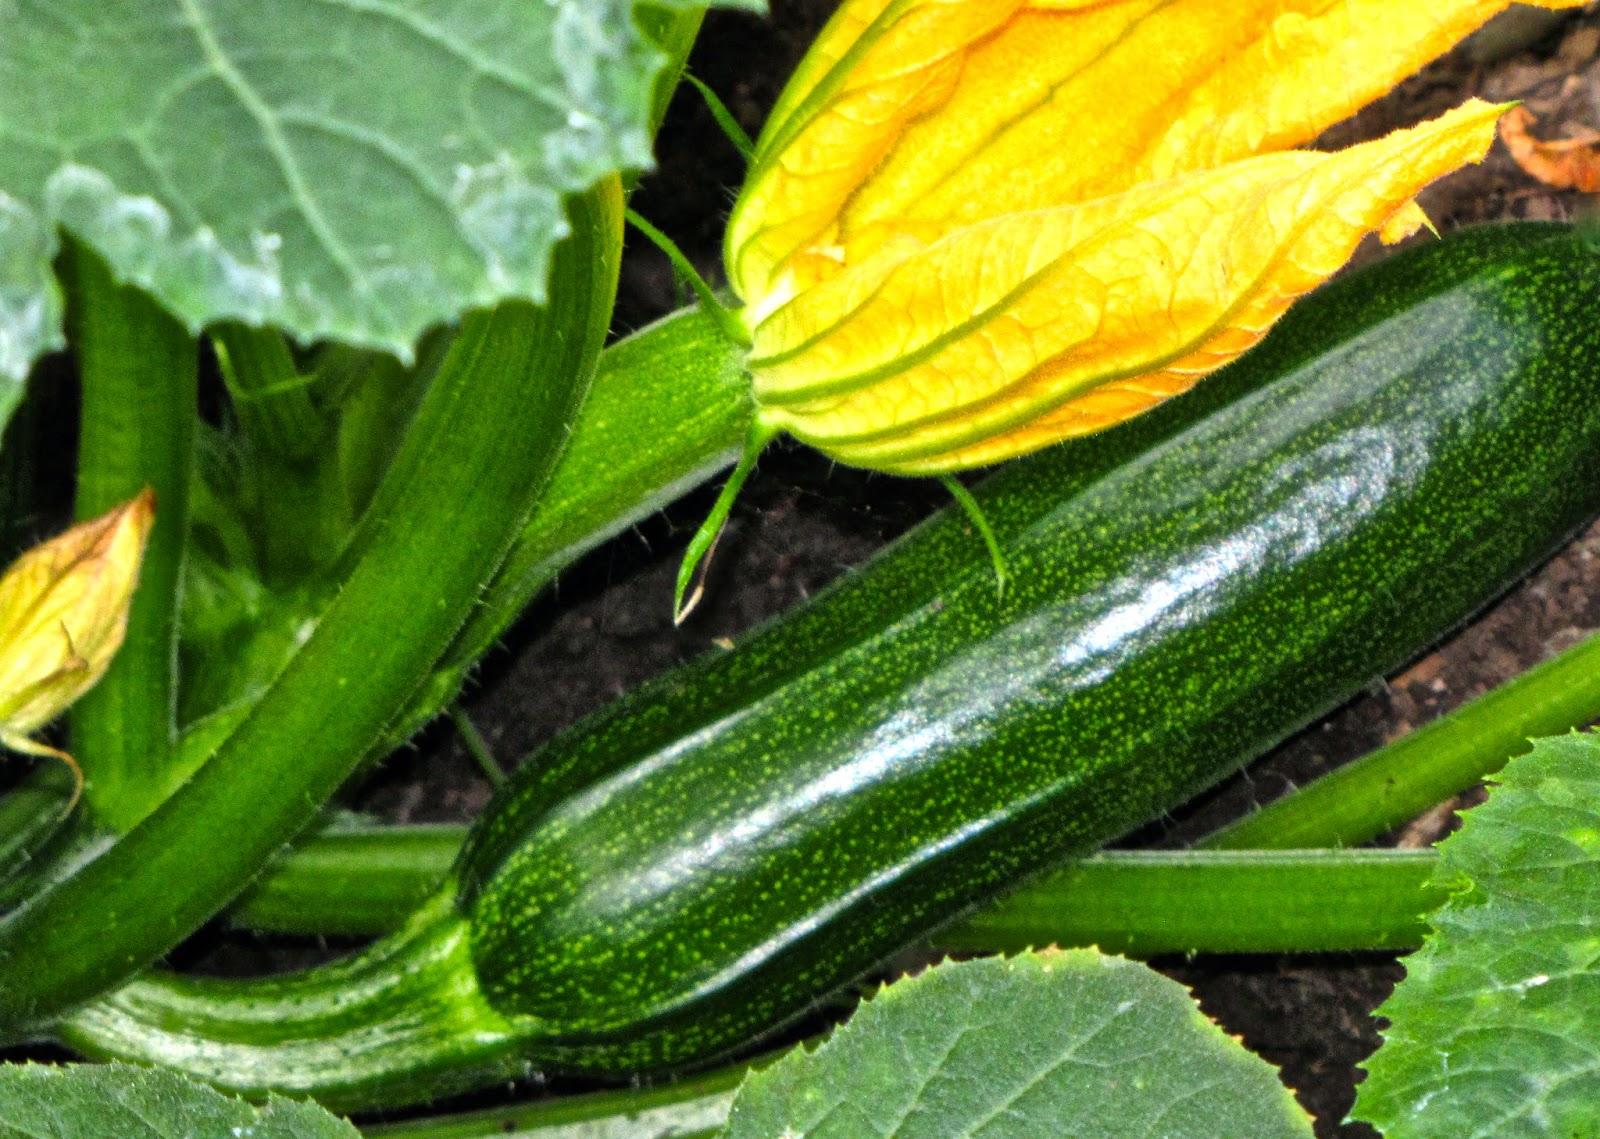 Sitkavores Zucchini